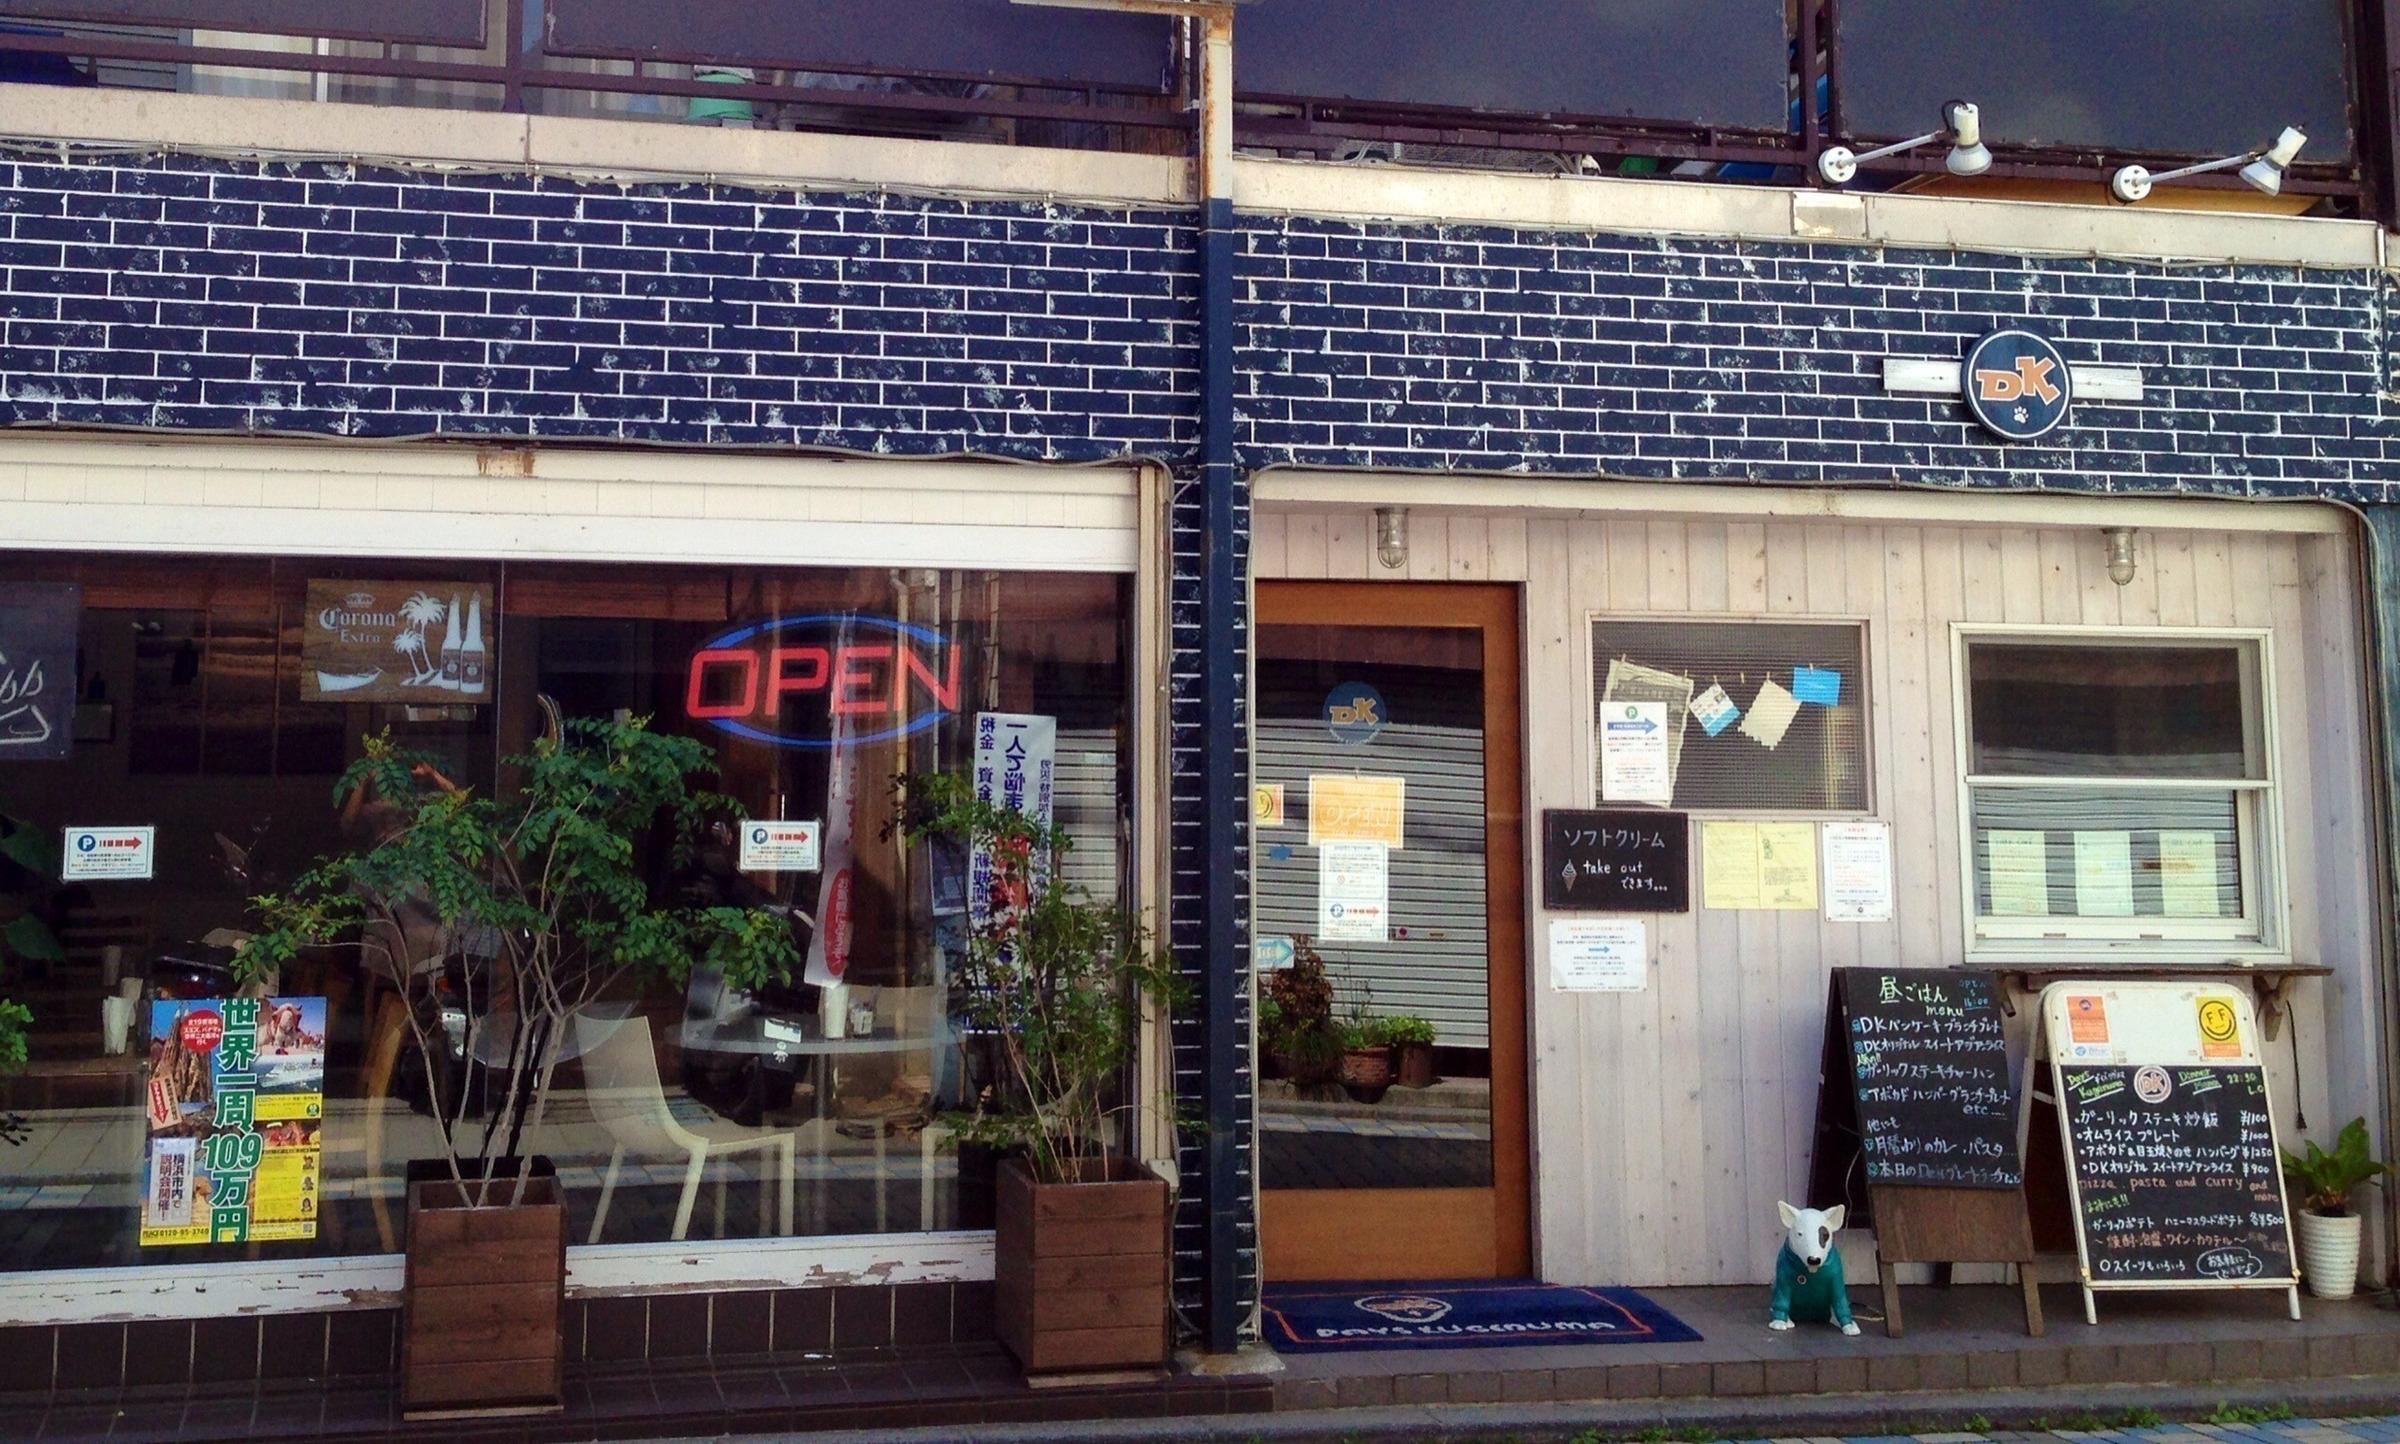 Days 鵠沼 (DAYS KUGENUMA)デイズ クゲヌマ|無国籍料理